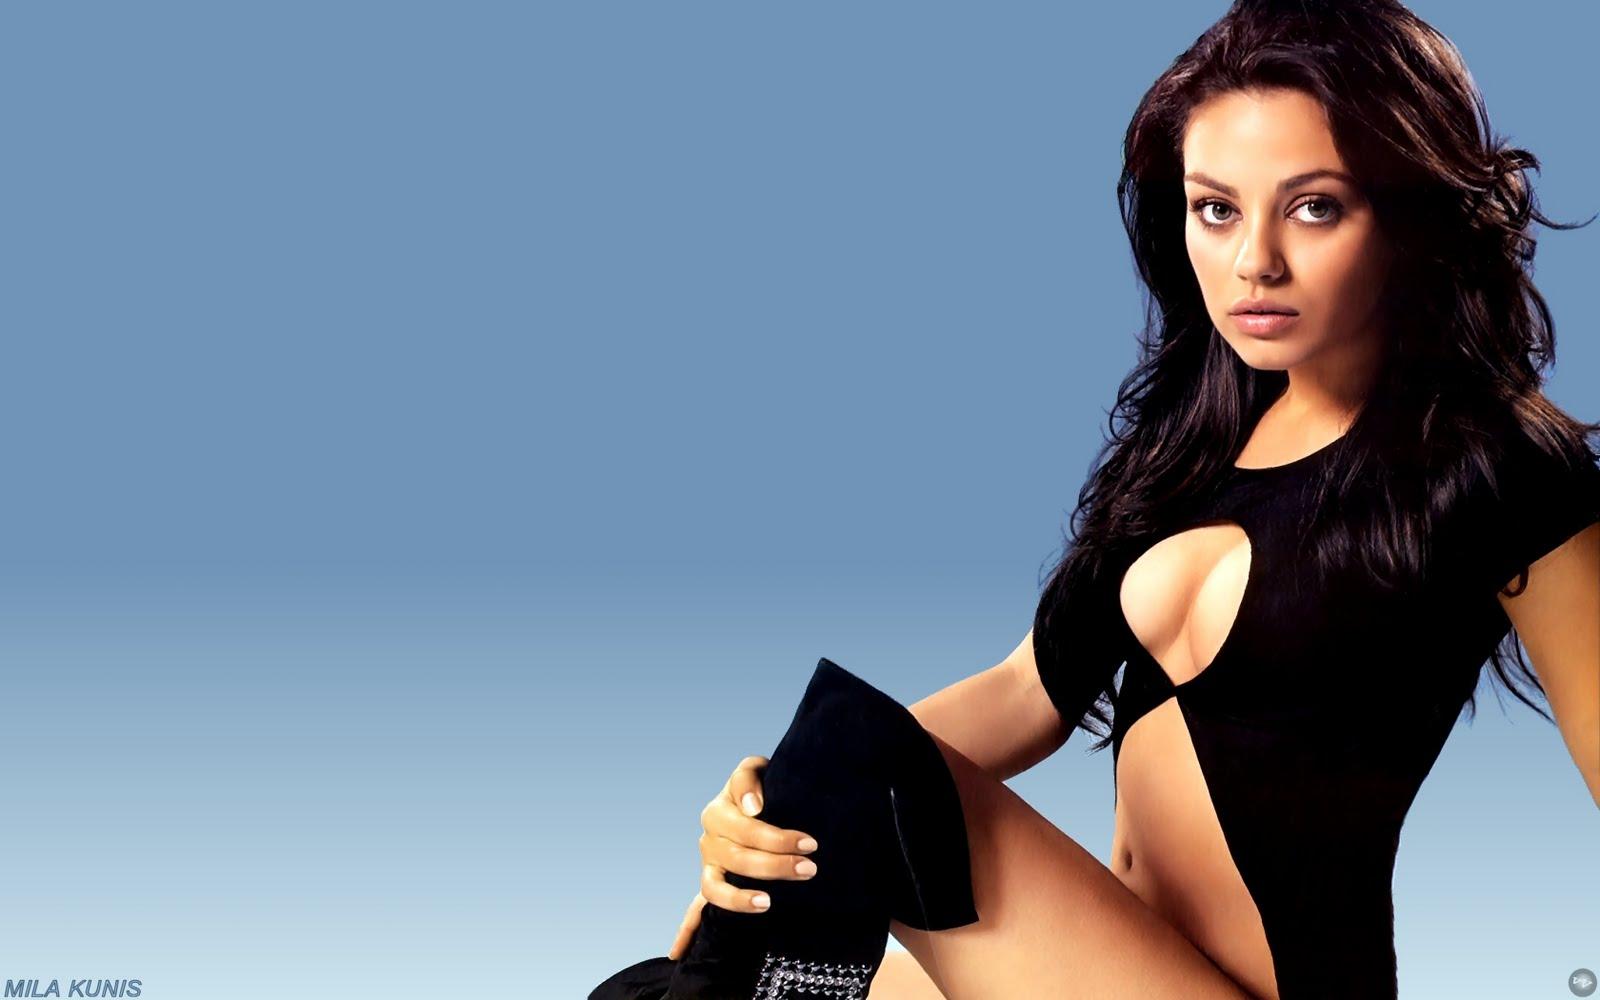 blogspotbollywood1: Mila Kunis From Black Swan To Justin ... Jessica Biel Split